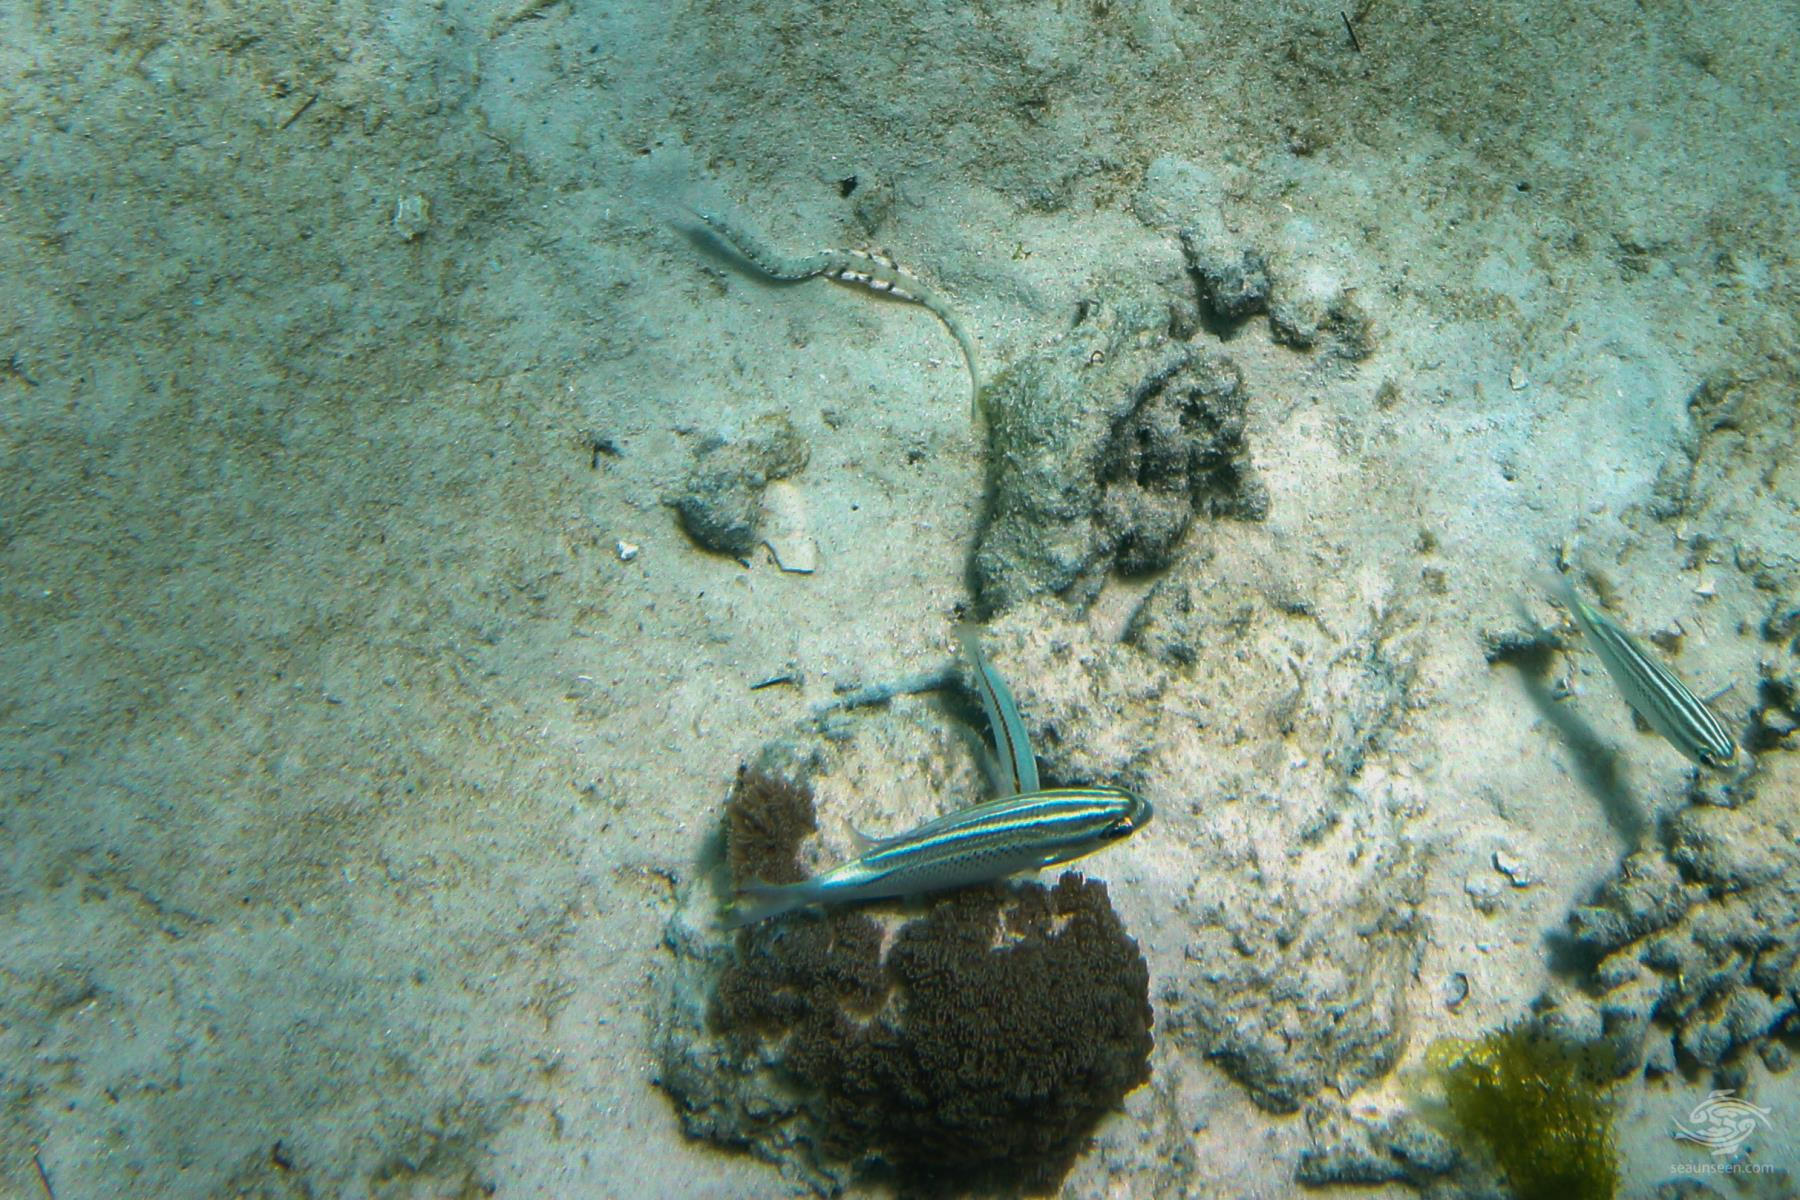 Zigzag wrasse Halichoeres Scapularis wrasse cleaning an Arabian spinecheeks Scolopsis ghanam. on Pemba island